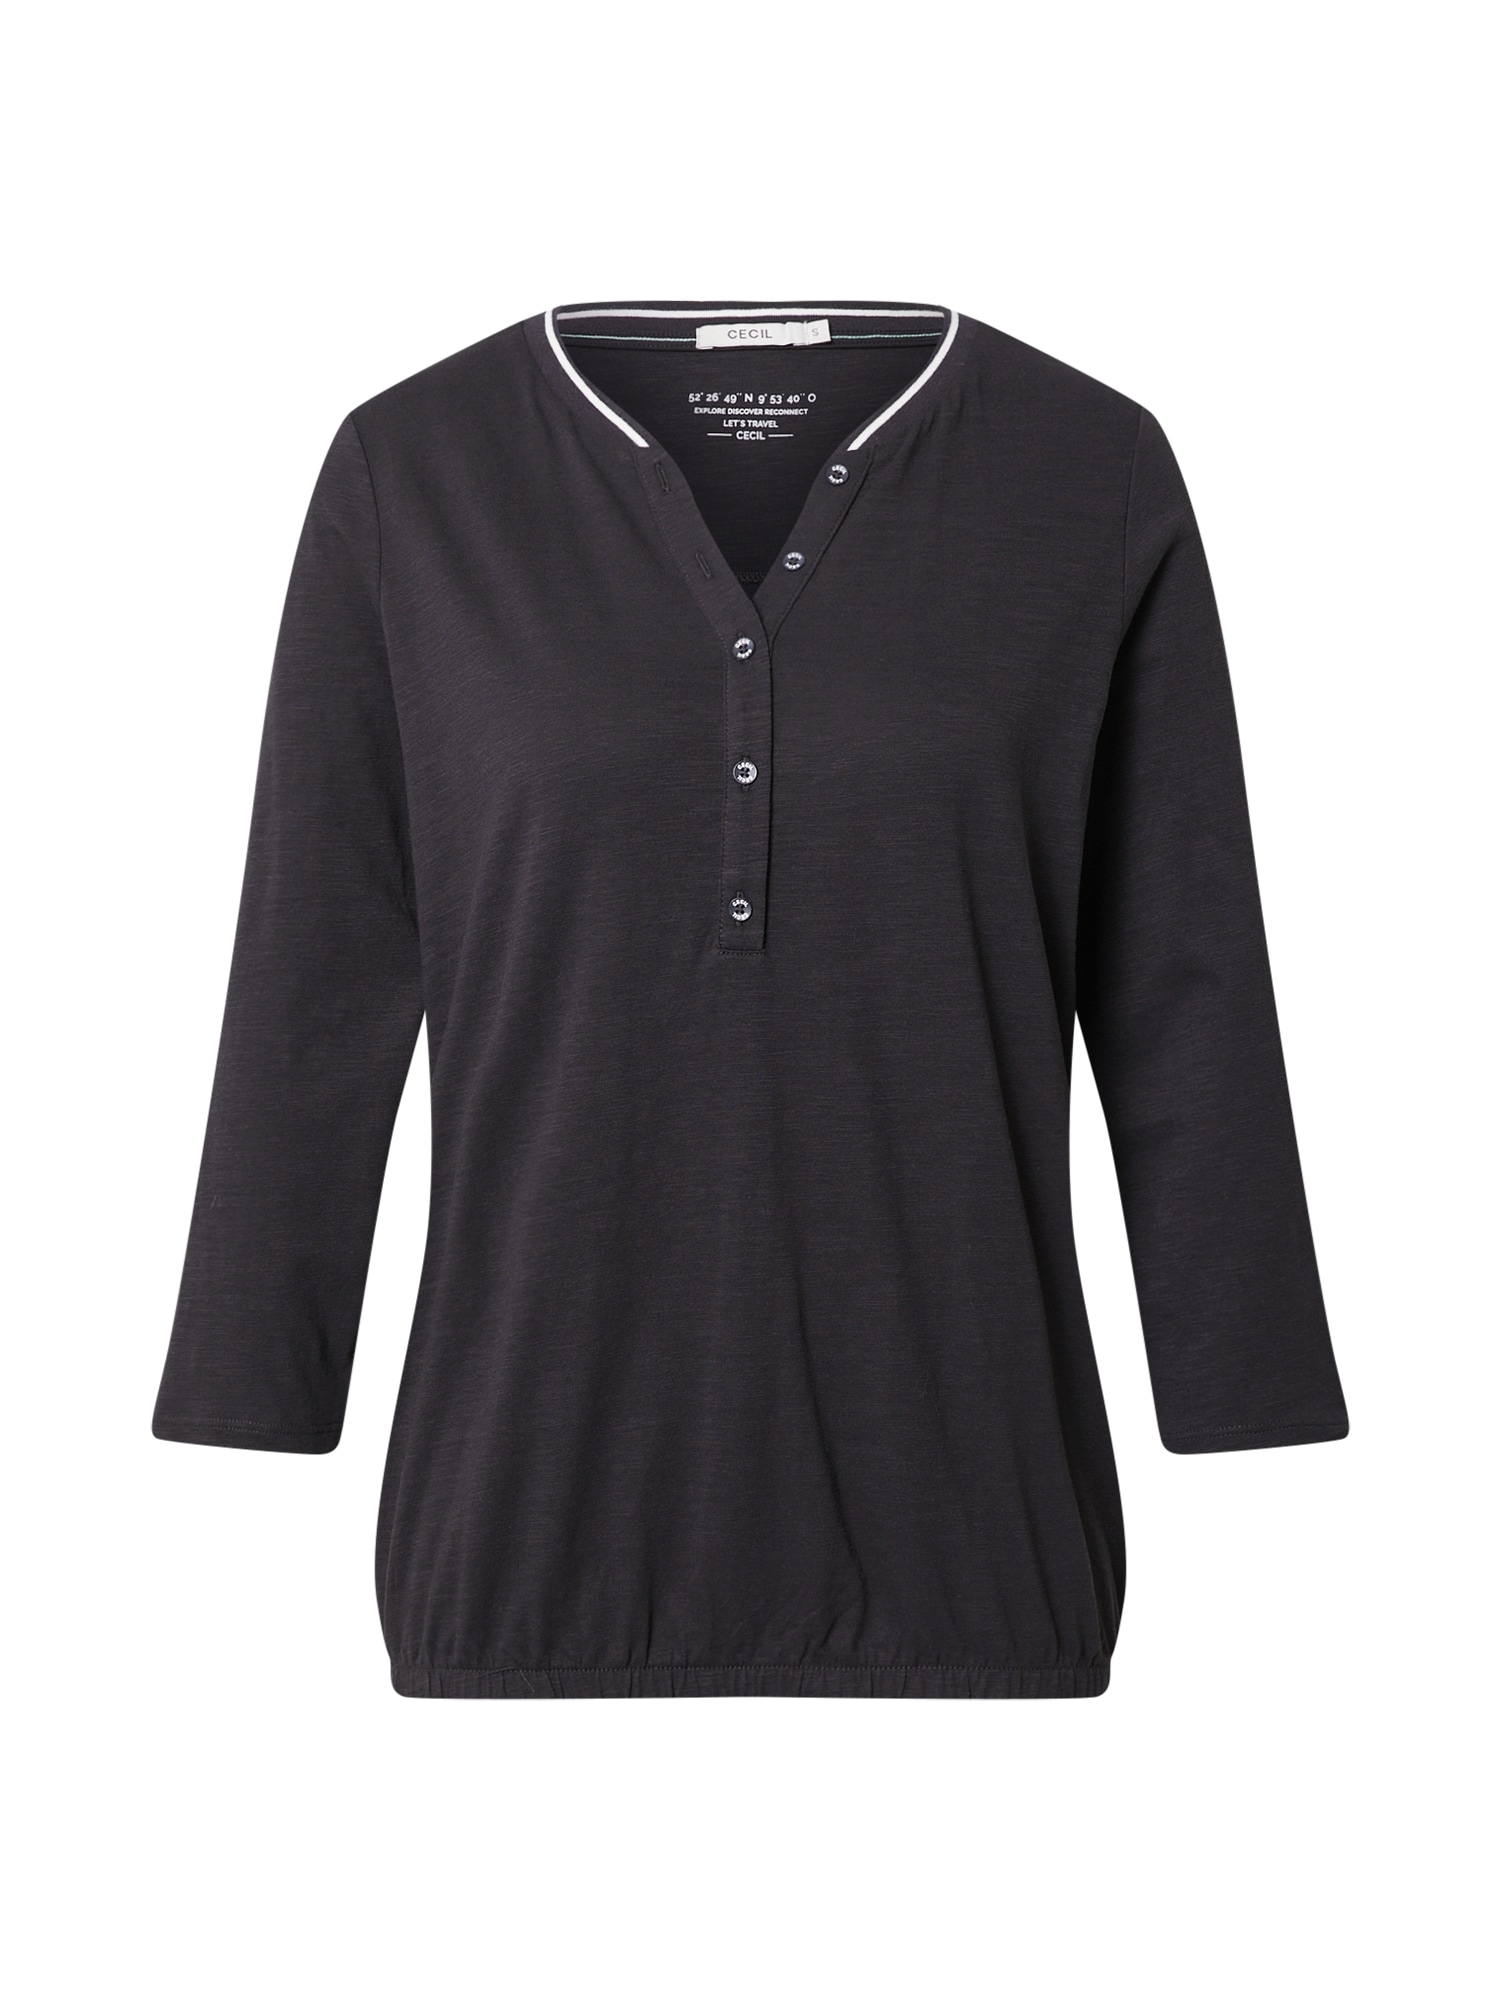 CECIL Marškinėliai bazalto pilka